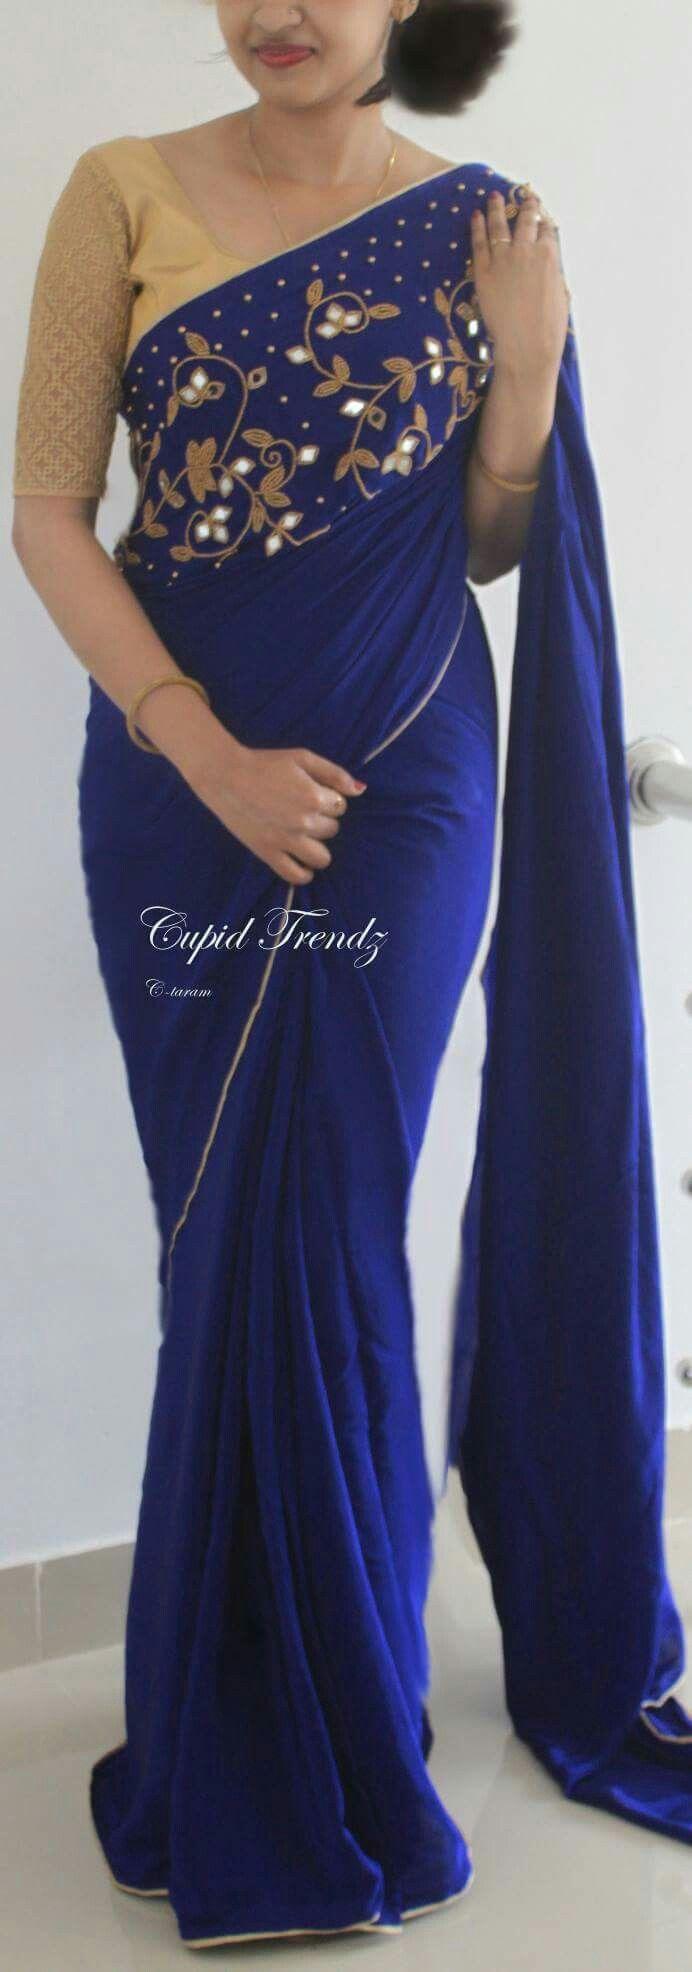 Pin by vaikuntapathy nelapalli on uma decisions pinterest saree